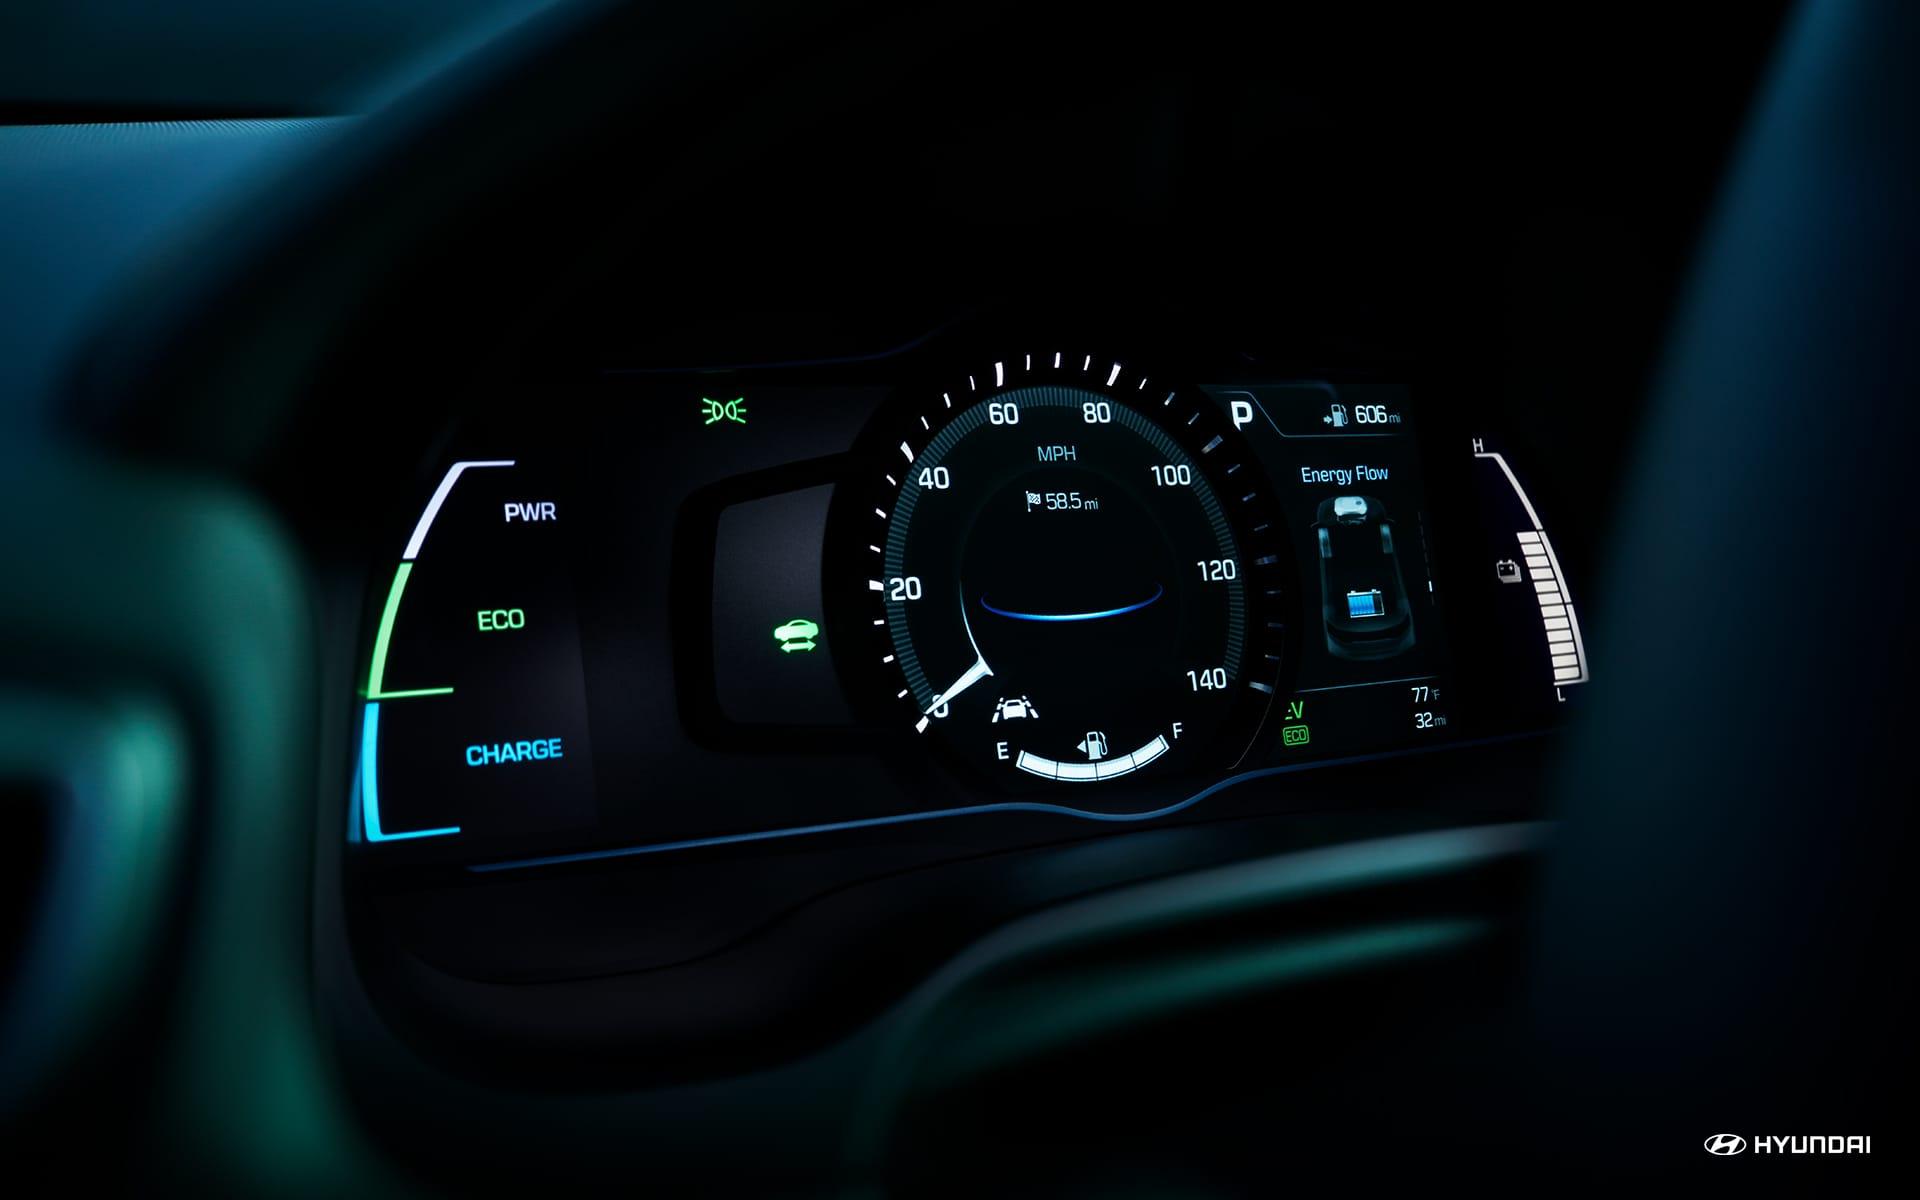 Instrument Cluster in the Hyundai Ioniq Hybrid